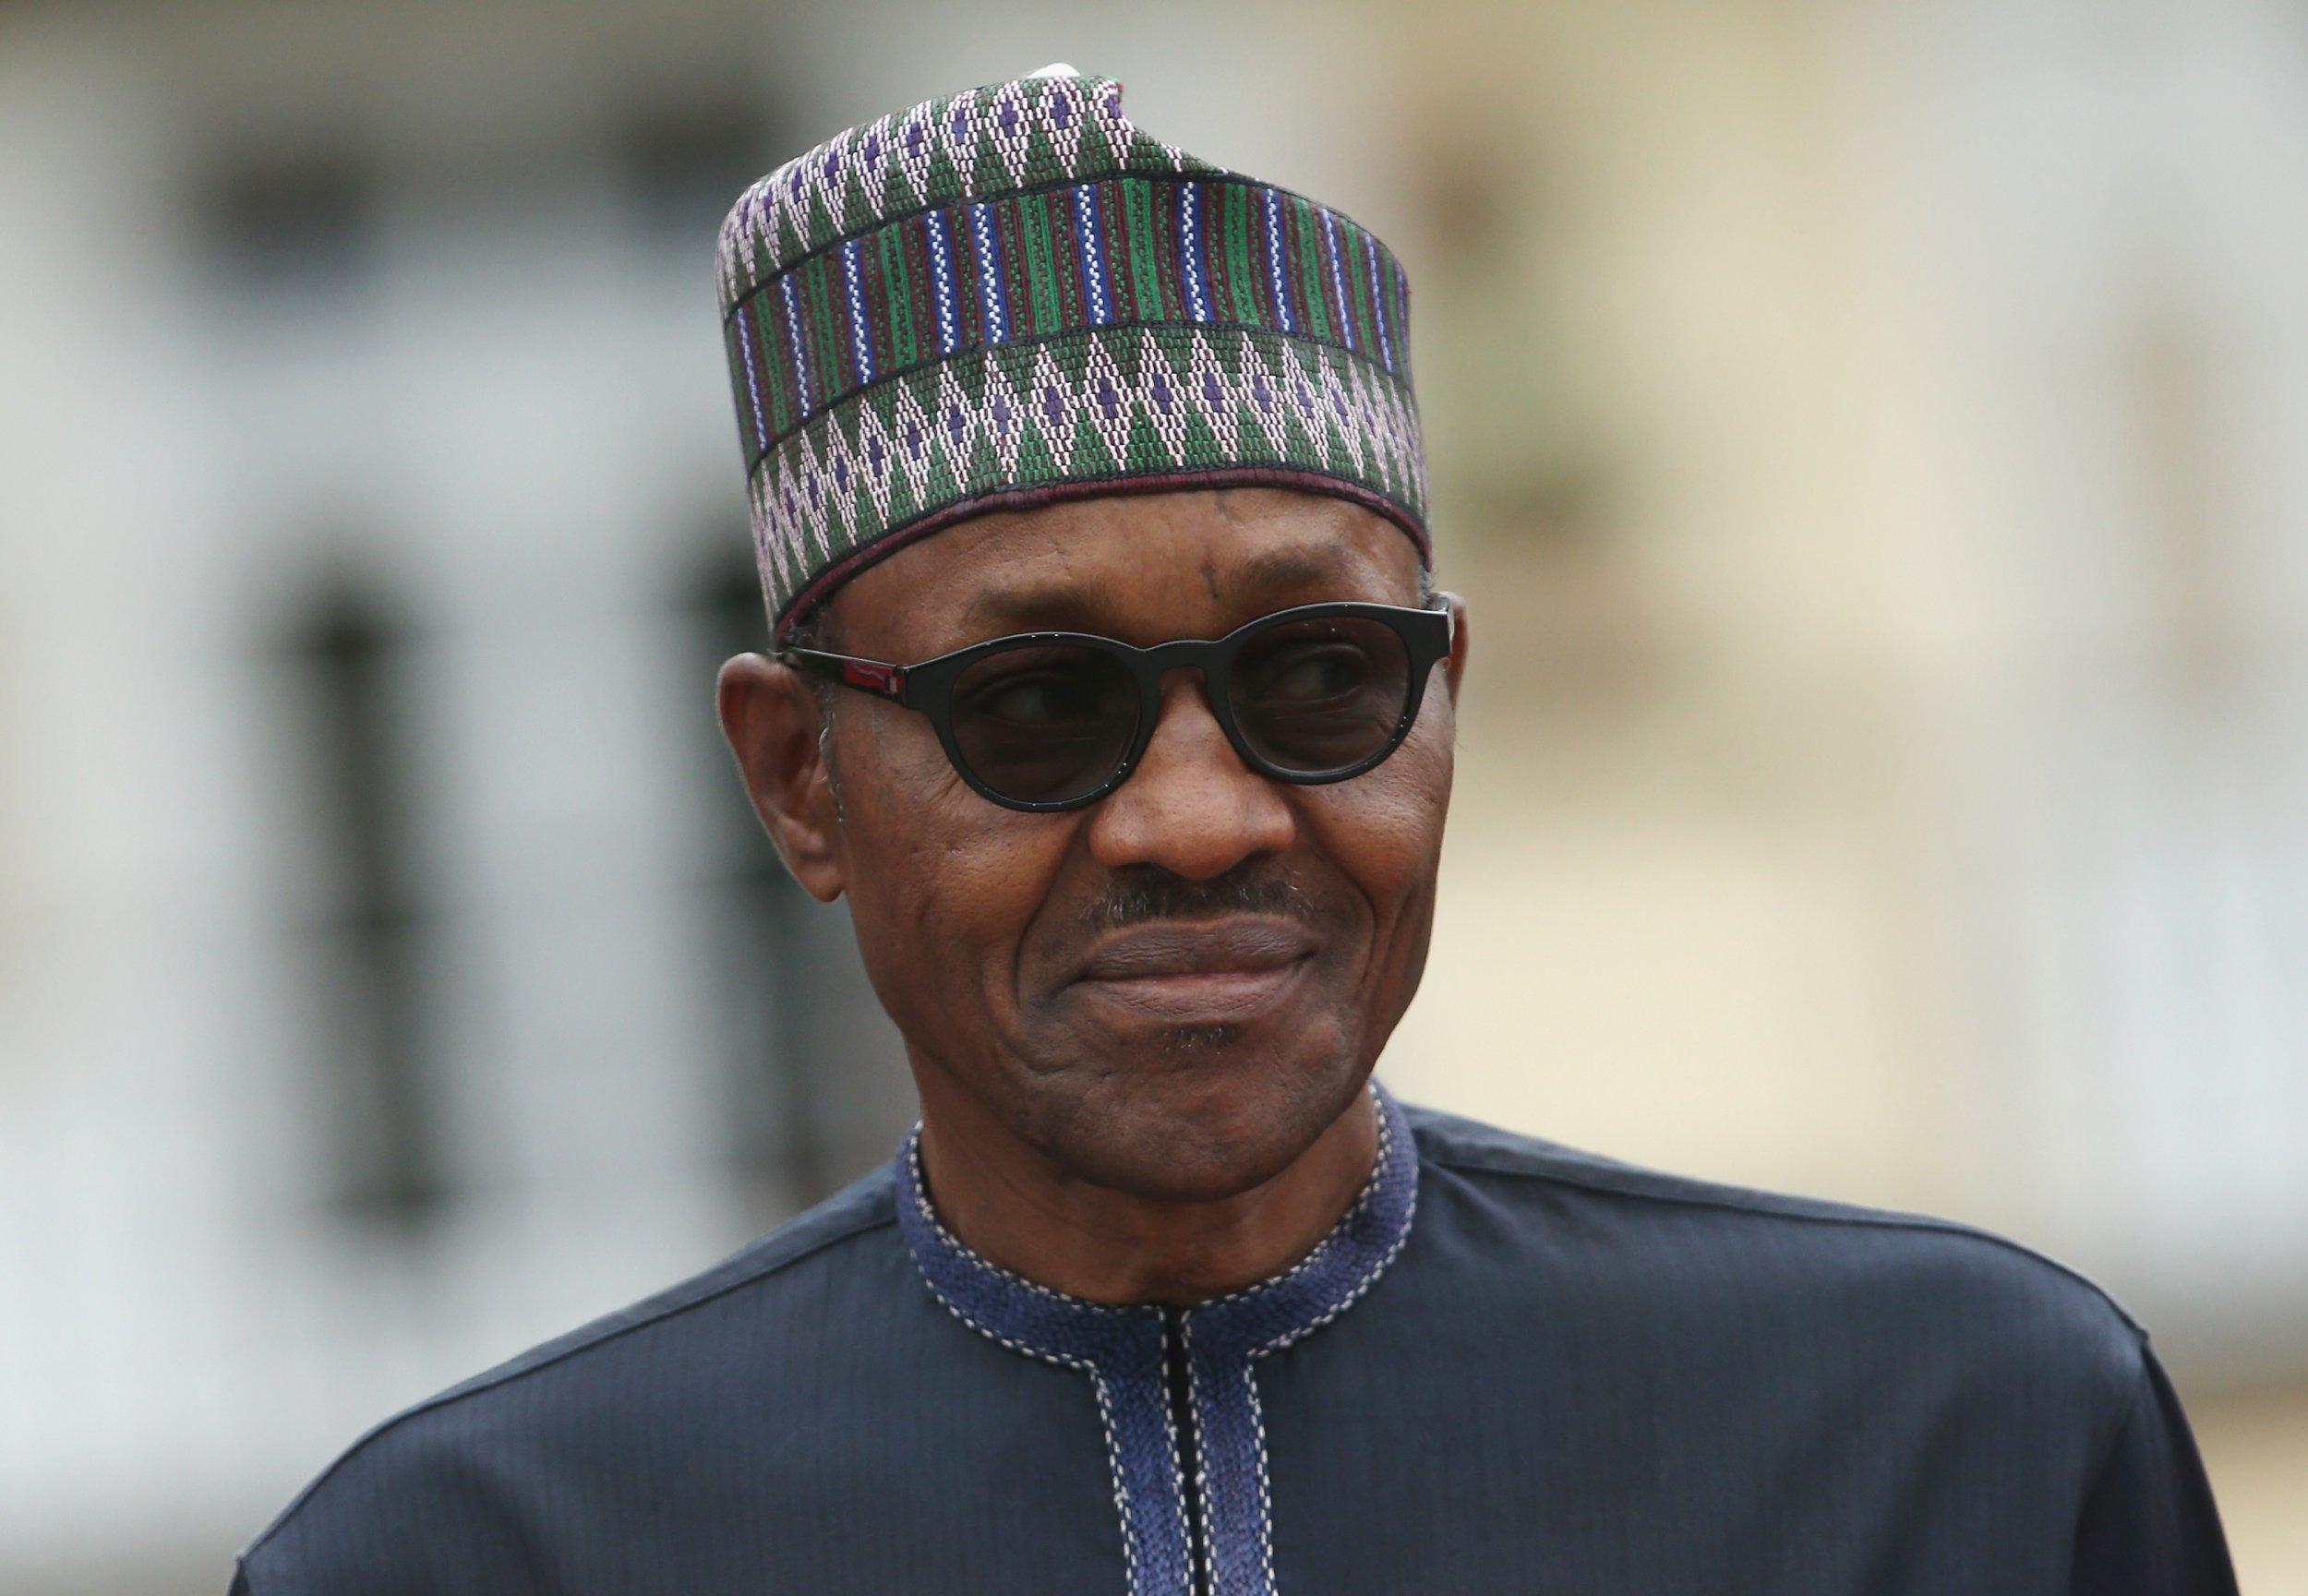 Buhari's Advisors Defend the Nigerian President's Progress